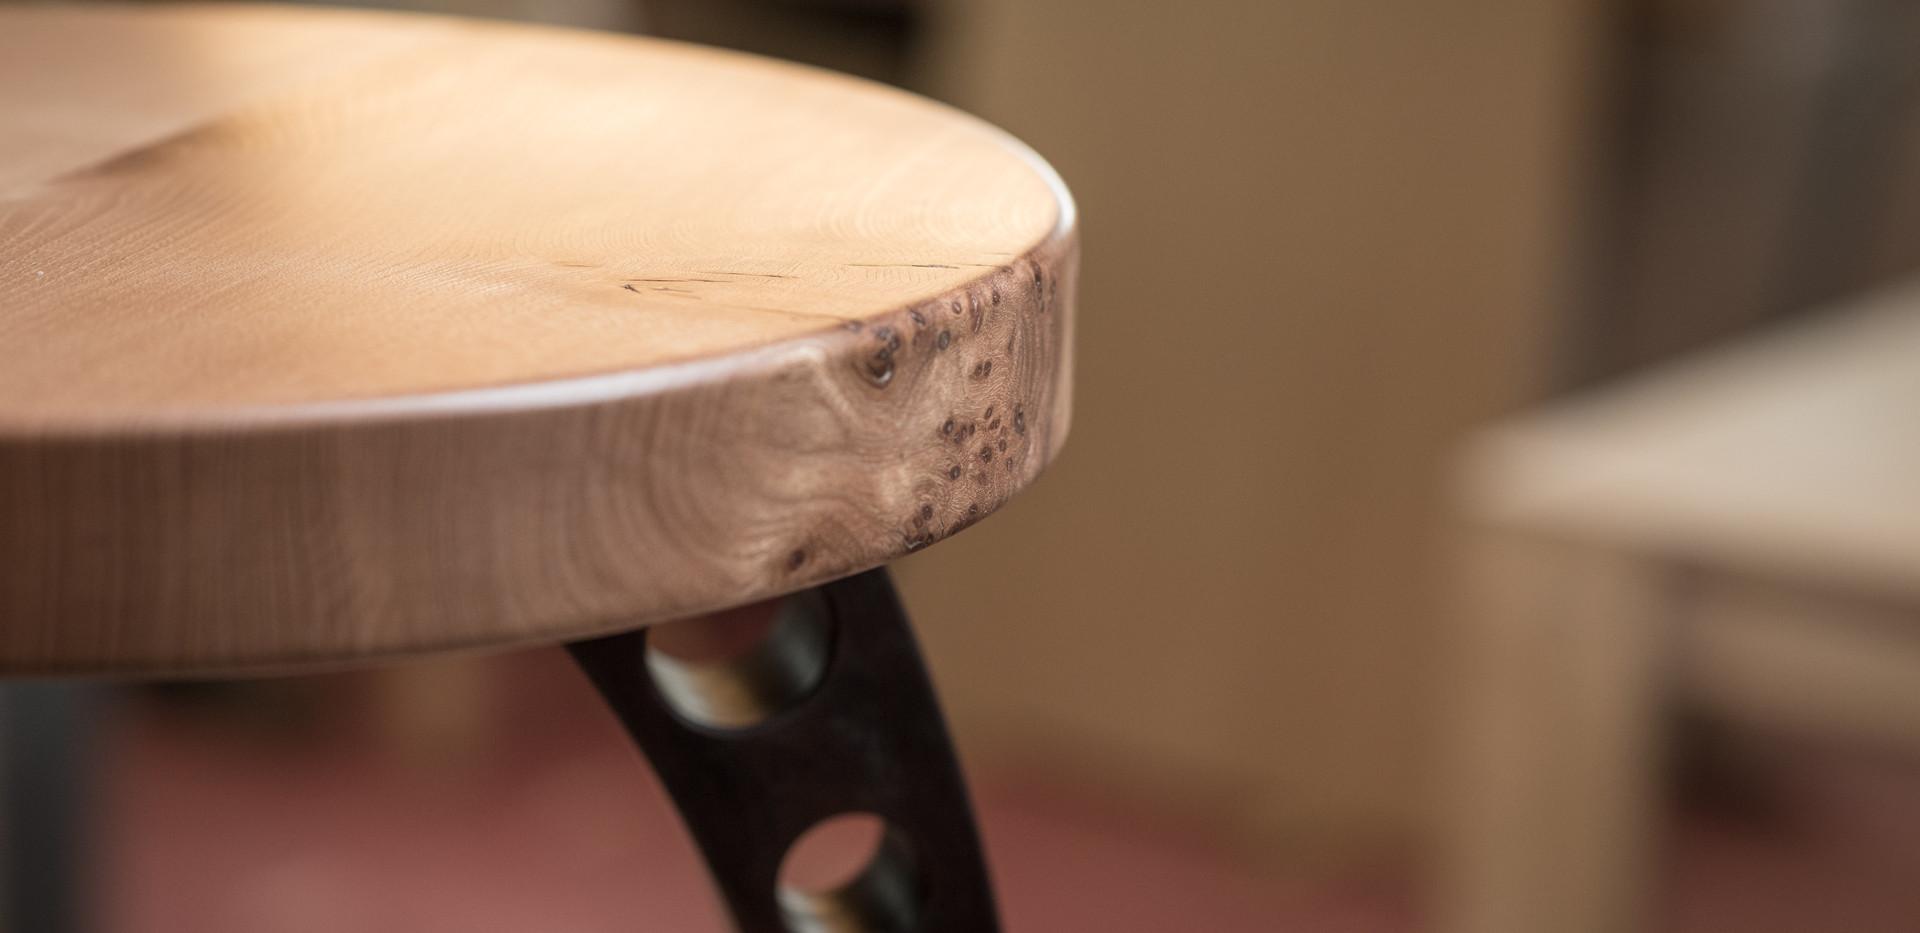 Elm Stool by Hatstand Design